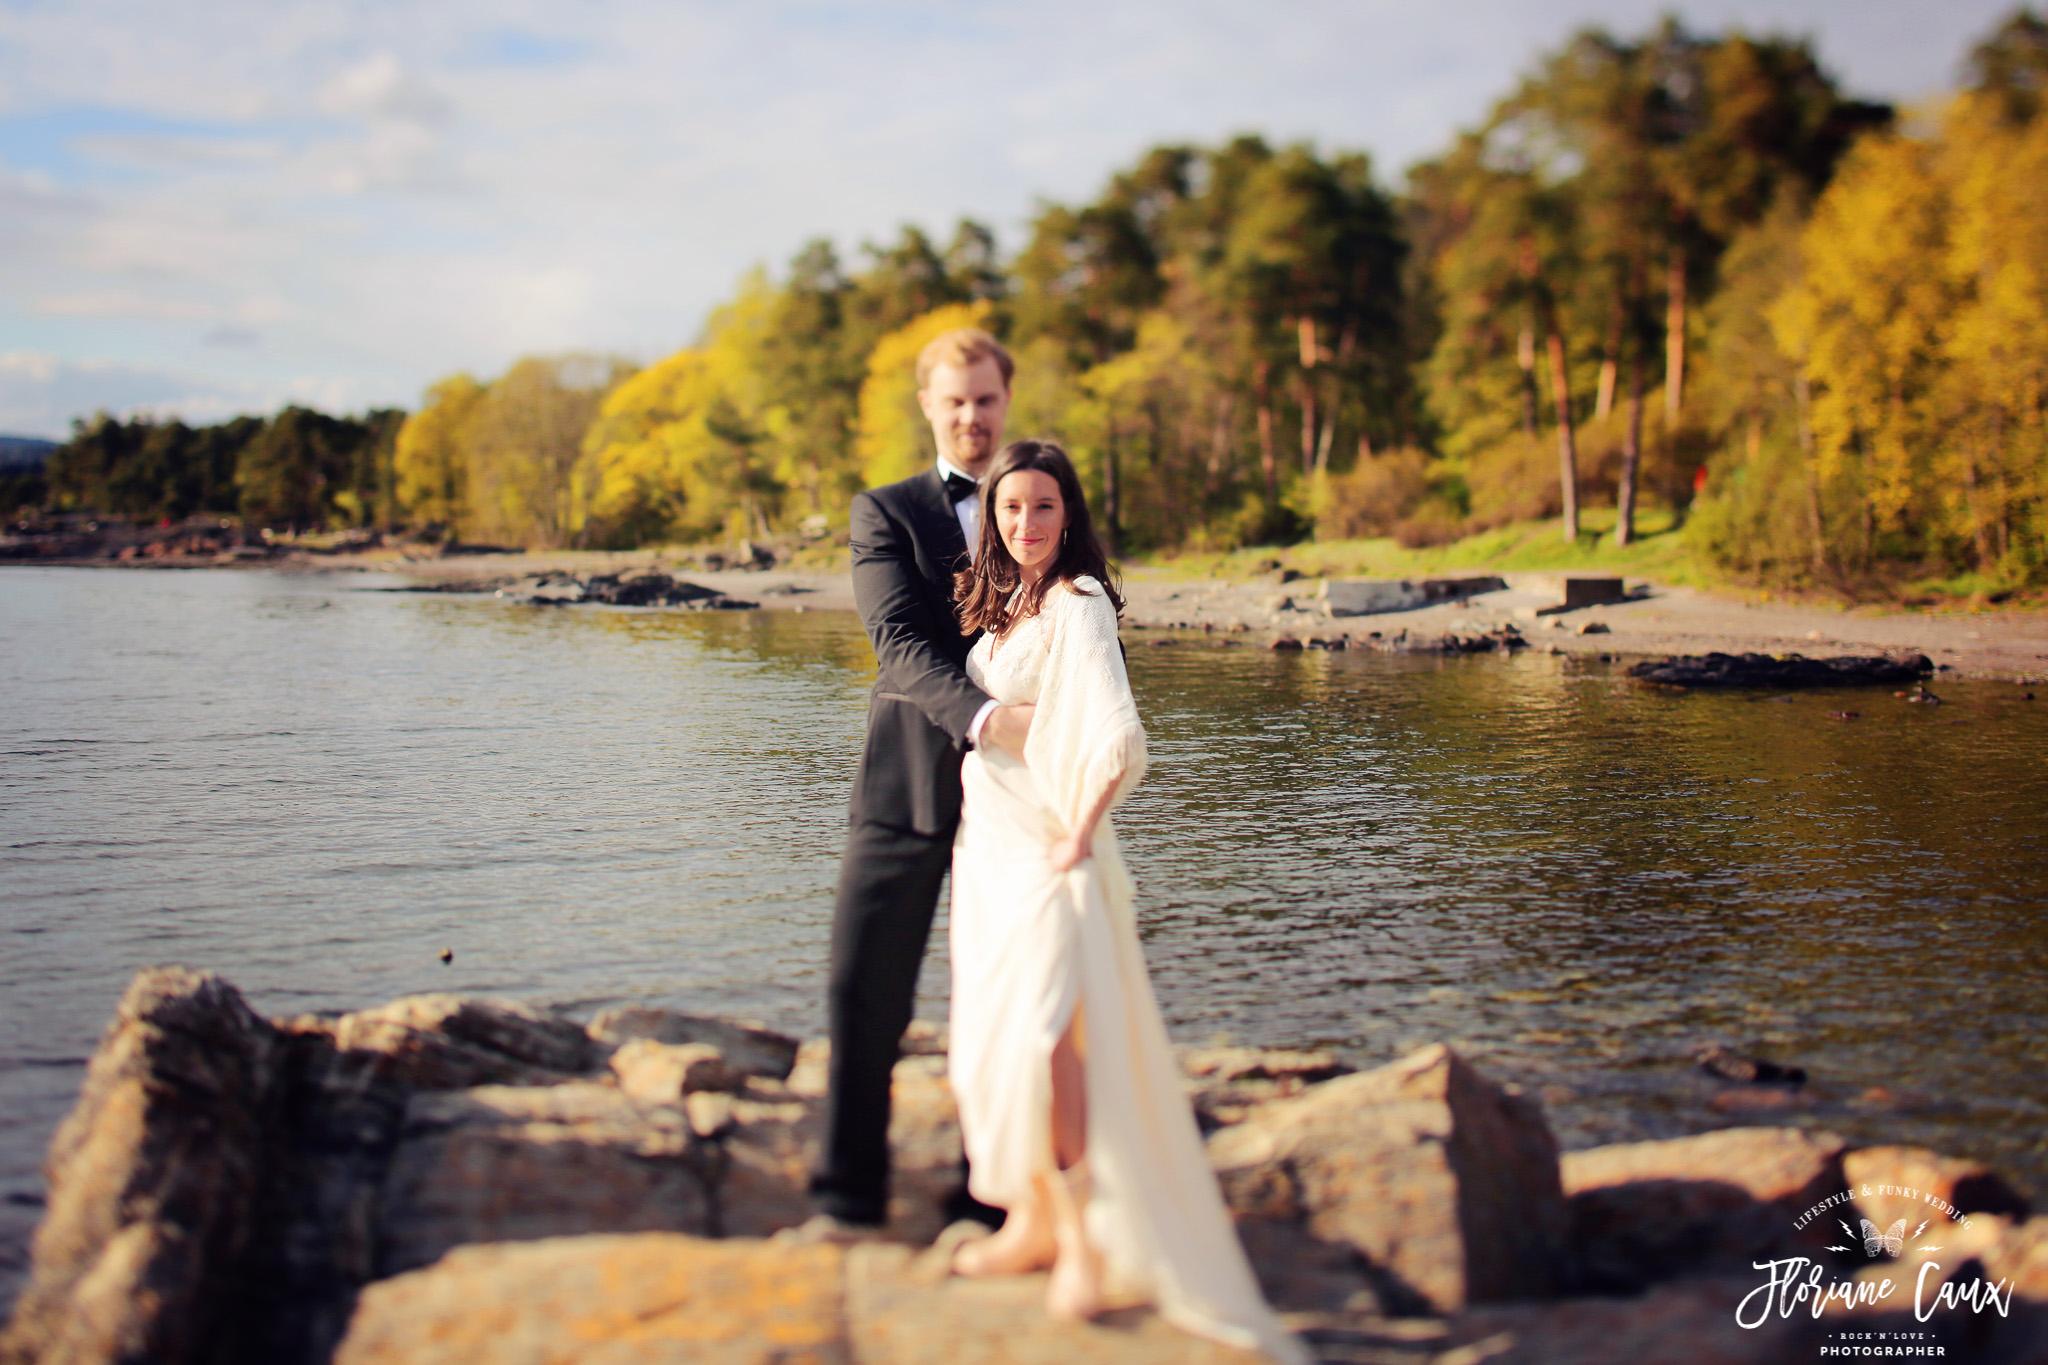 destination-wedding-photographer-oslo-norway-floriane-caux-75